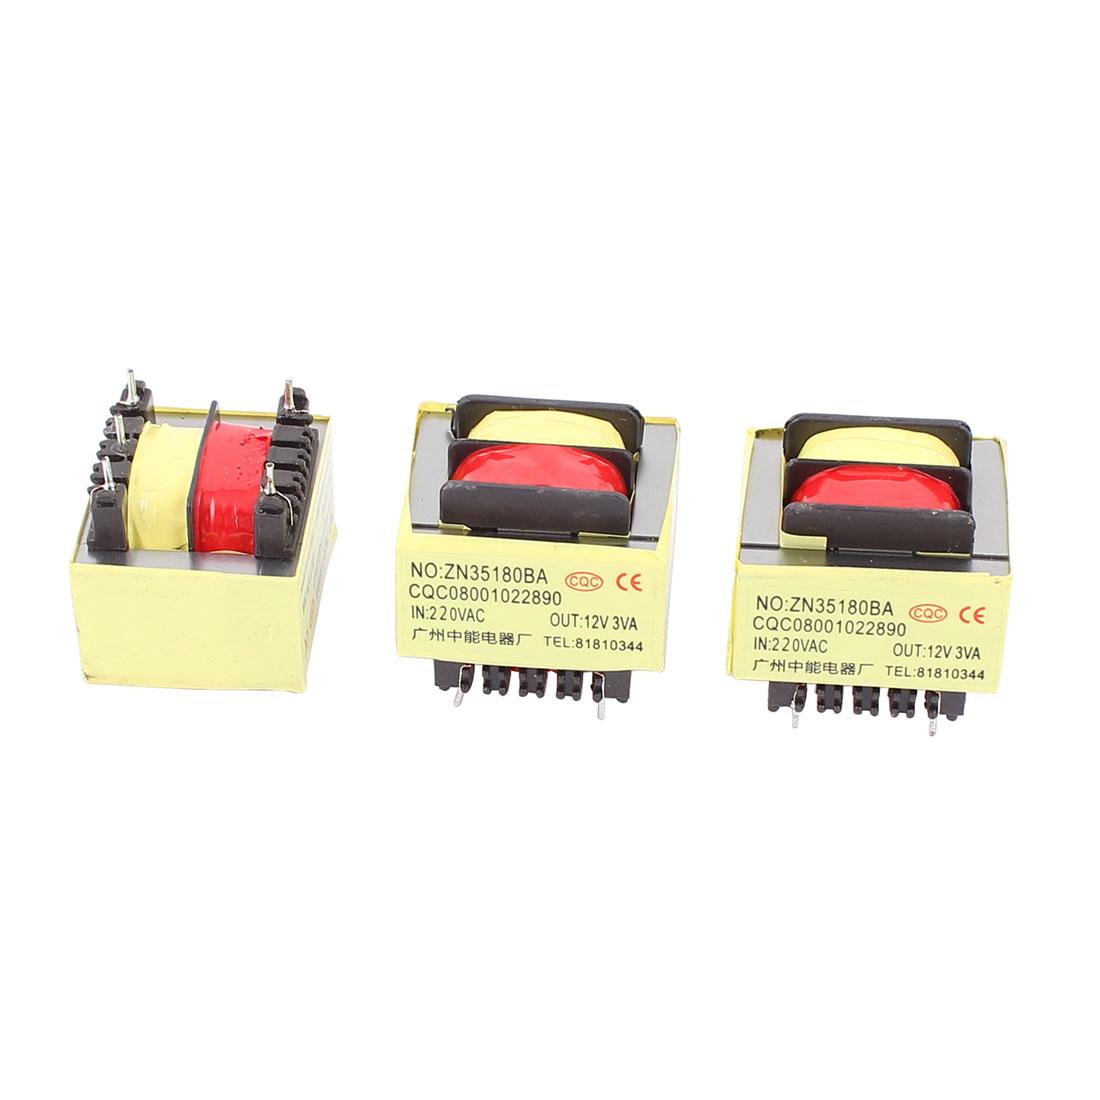 3Pcs 220V Input 12V 3VA Output Yellow Red 5-Terminal Power Transformer 36x31x31mm